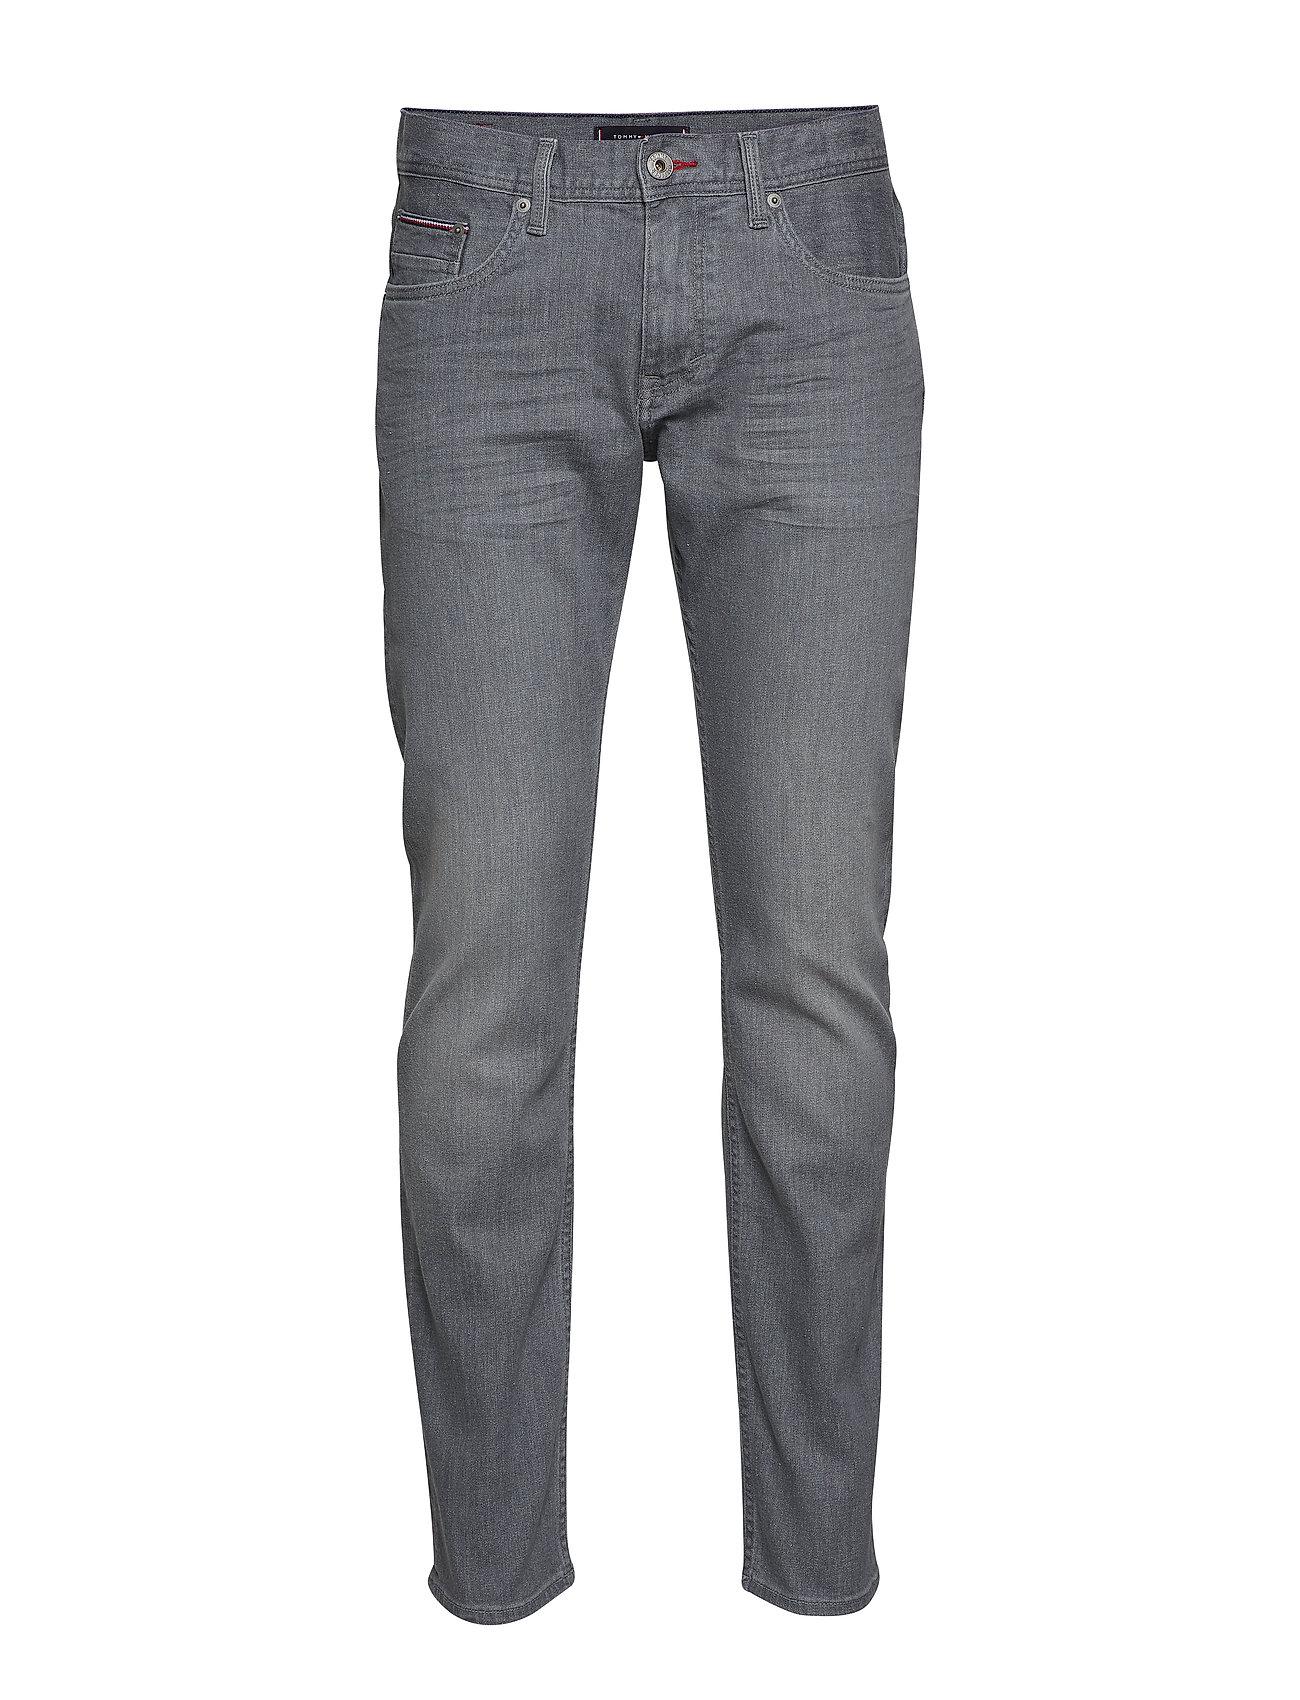 Image of Slim Bleecker Str Maumee Grey Slim Jeans Blå TOMMY HILFIGER (3148640719)